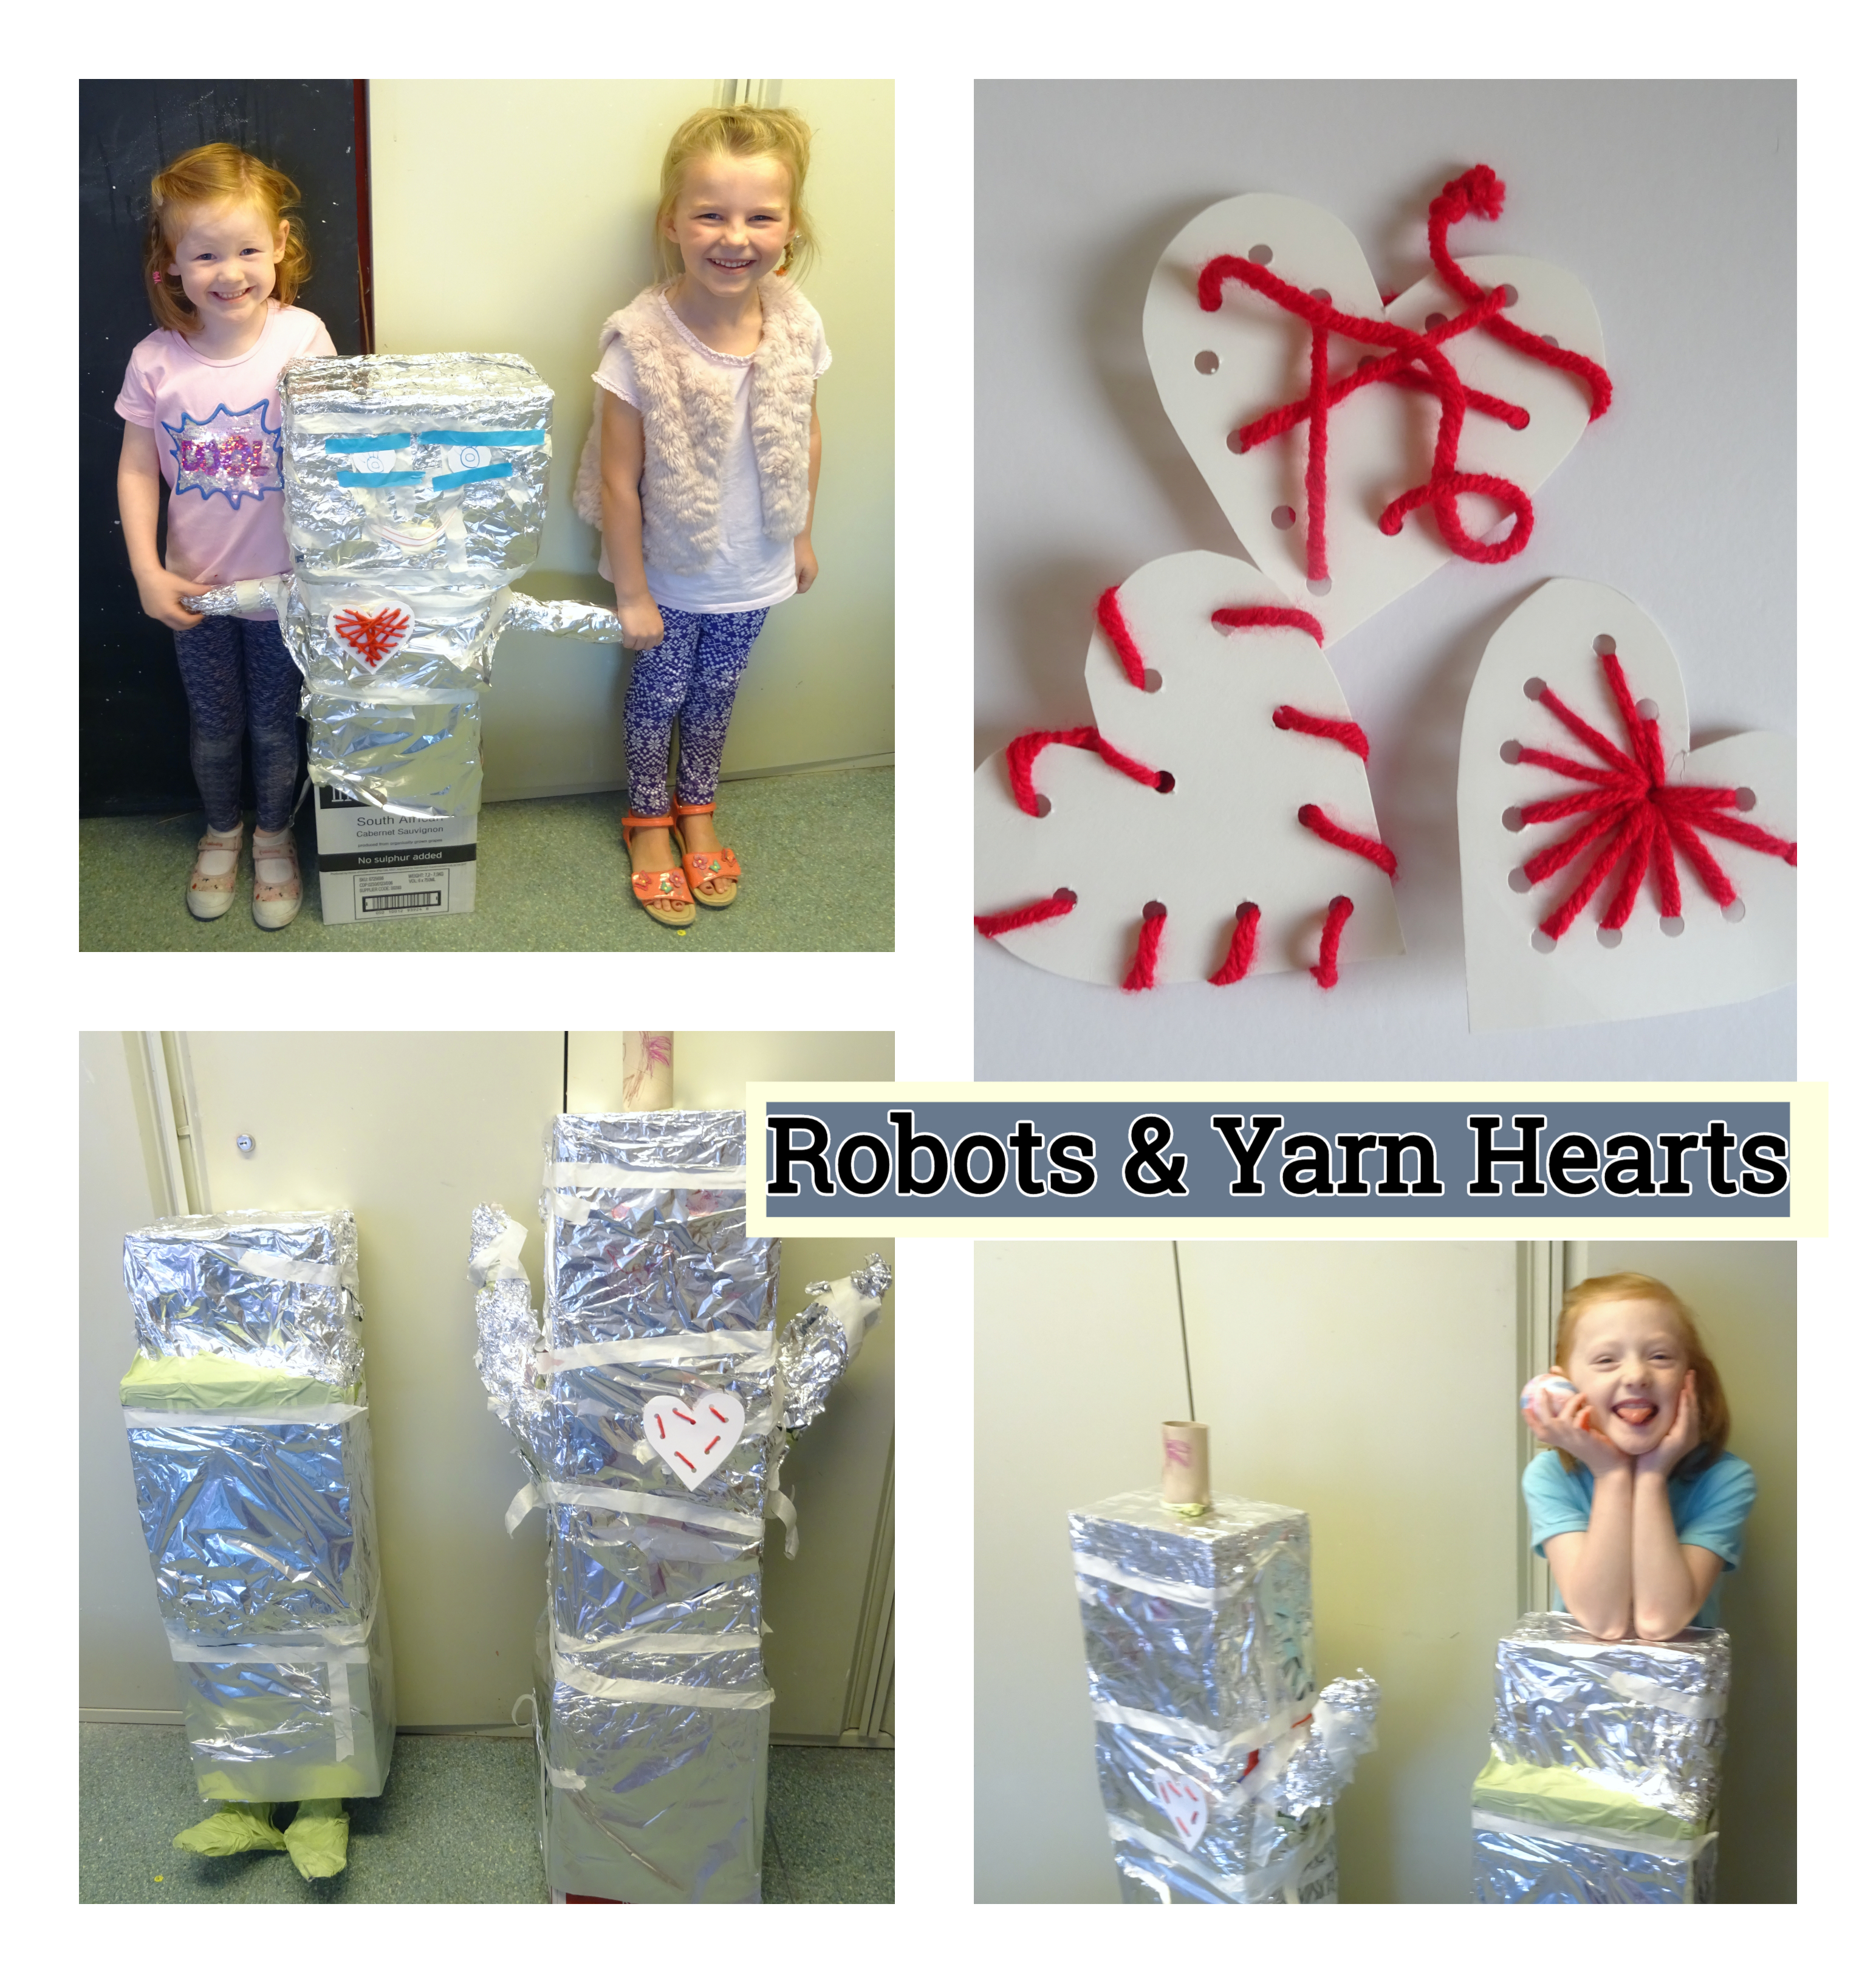 Robots & Yarn Hearts